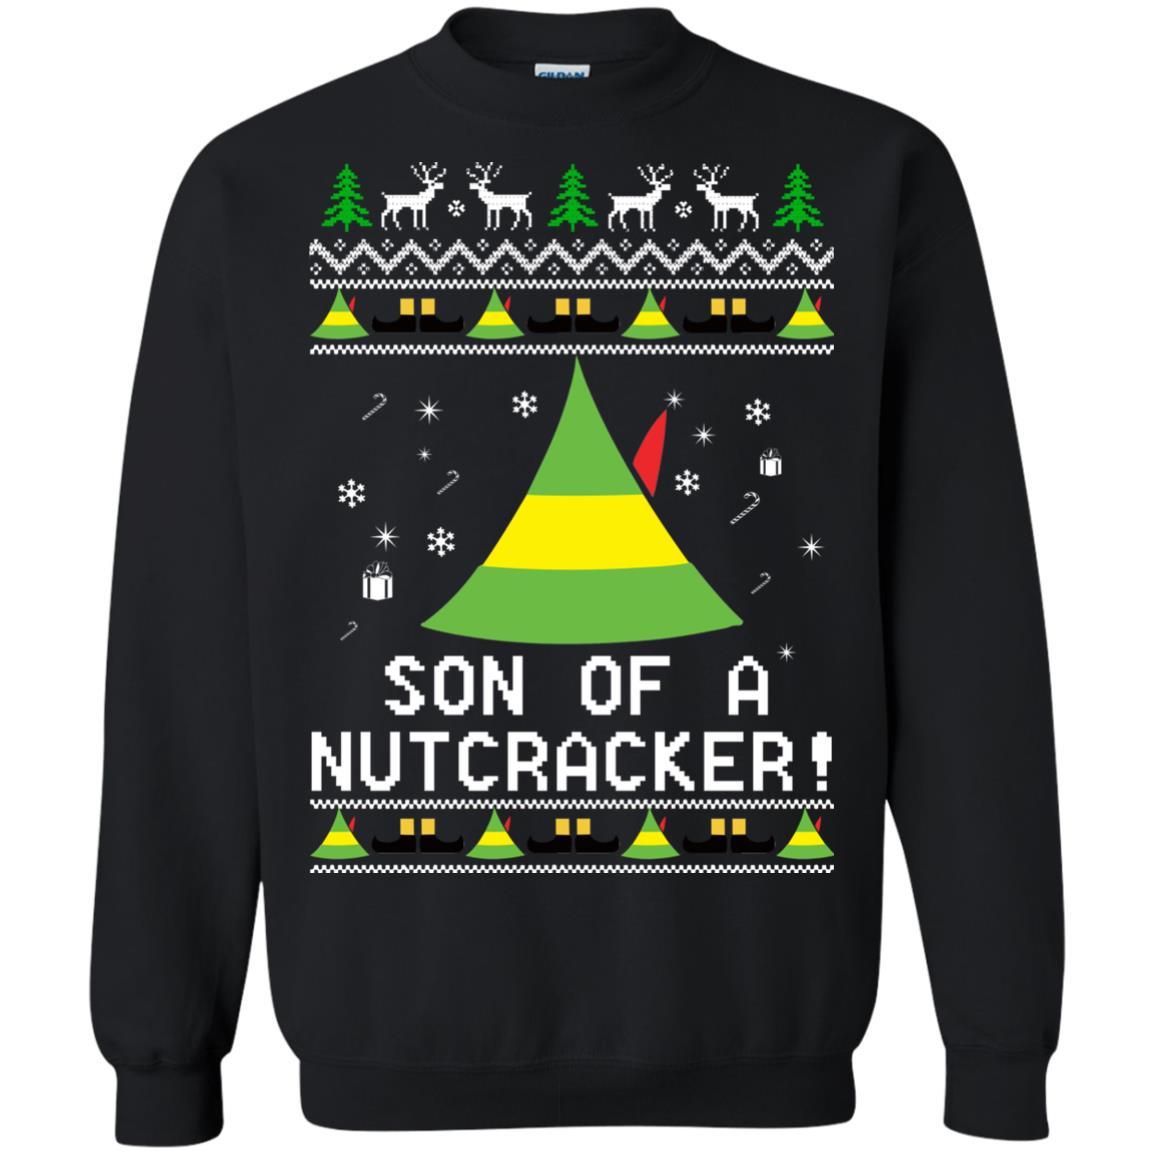 image 1982 - Son of a Nutcracker Elf Christmas Sweatshirt, Ugly Sweater